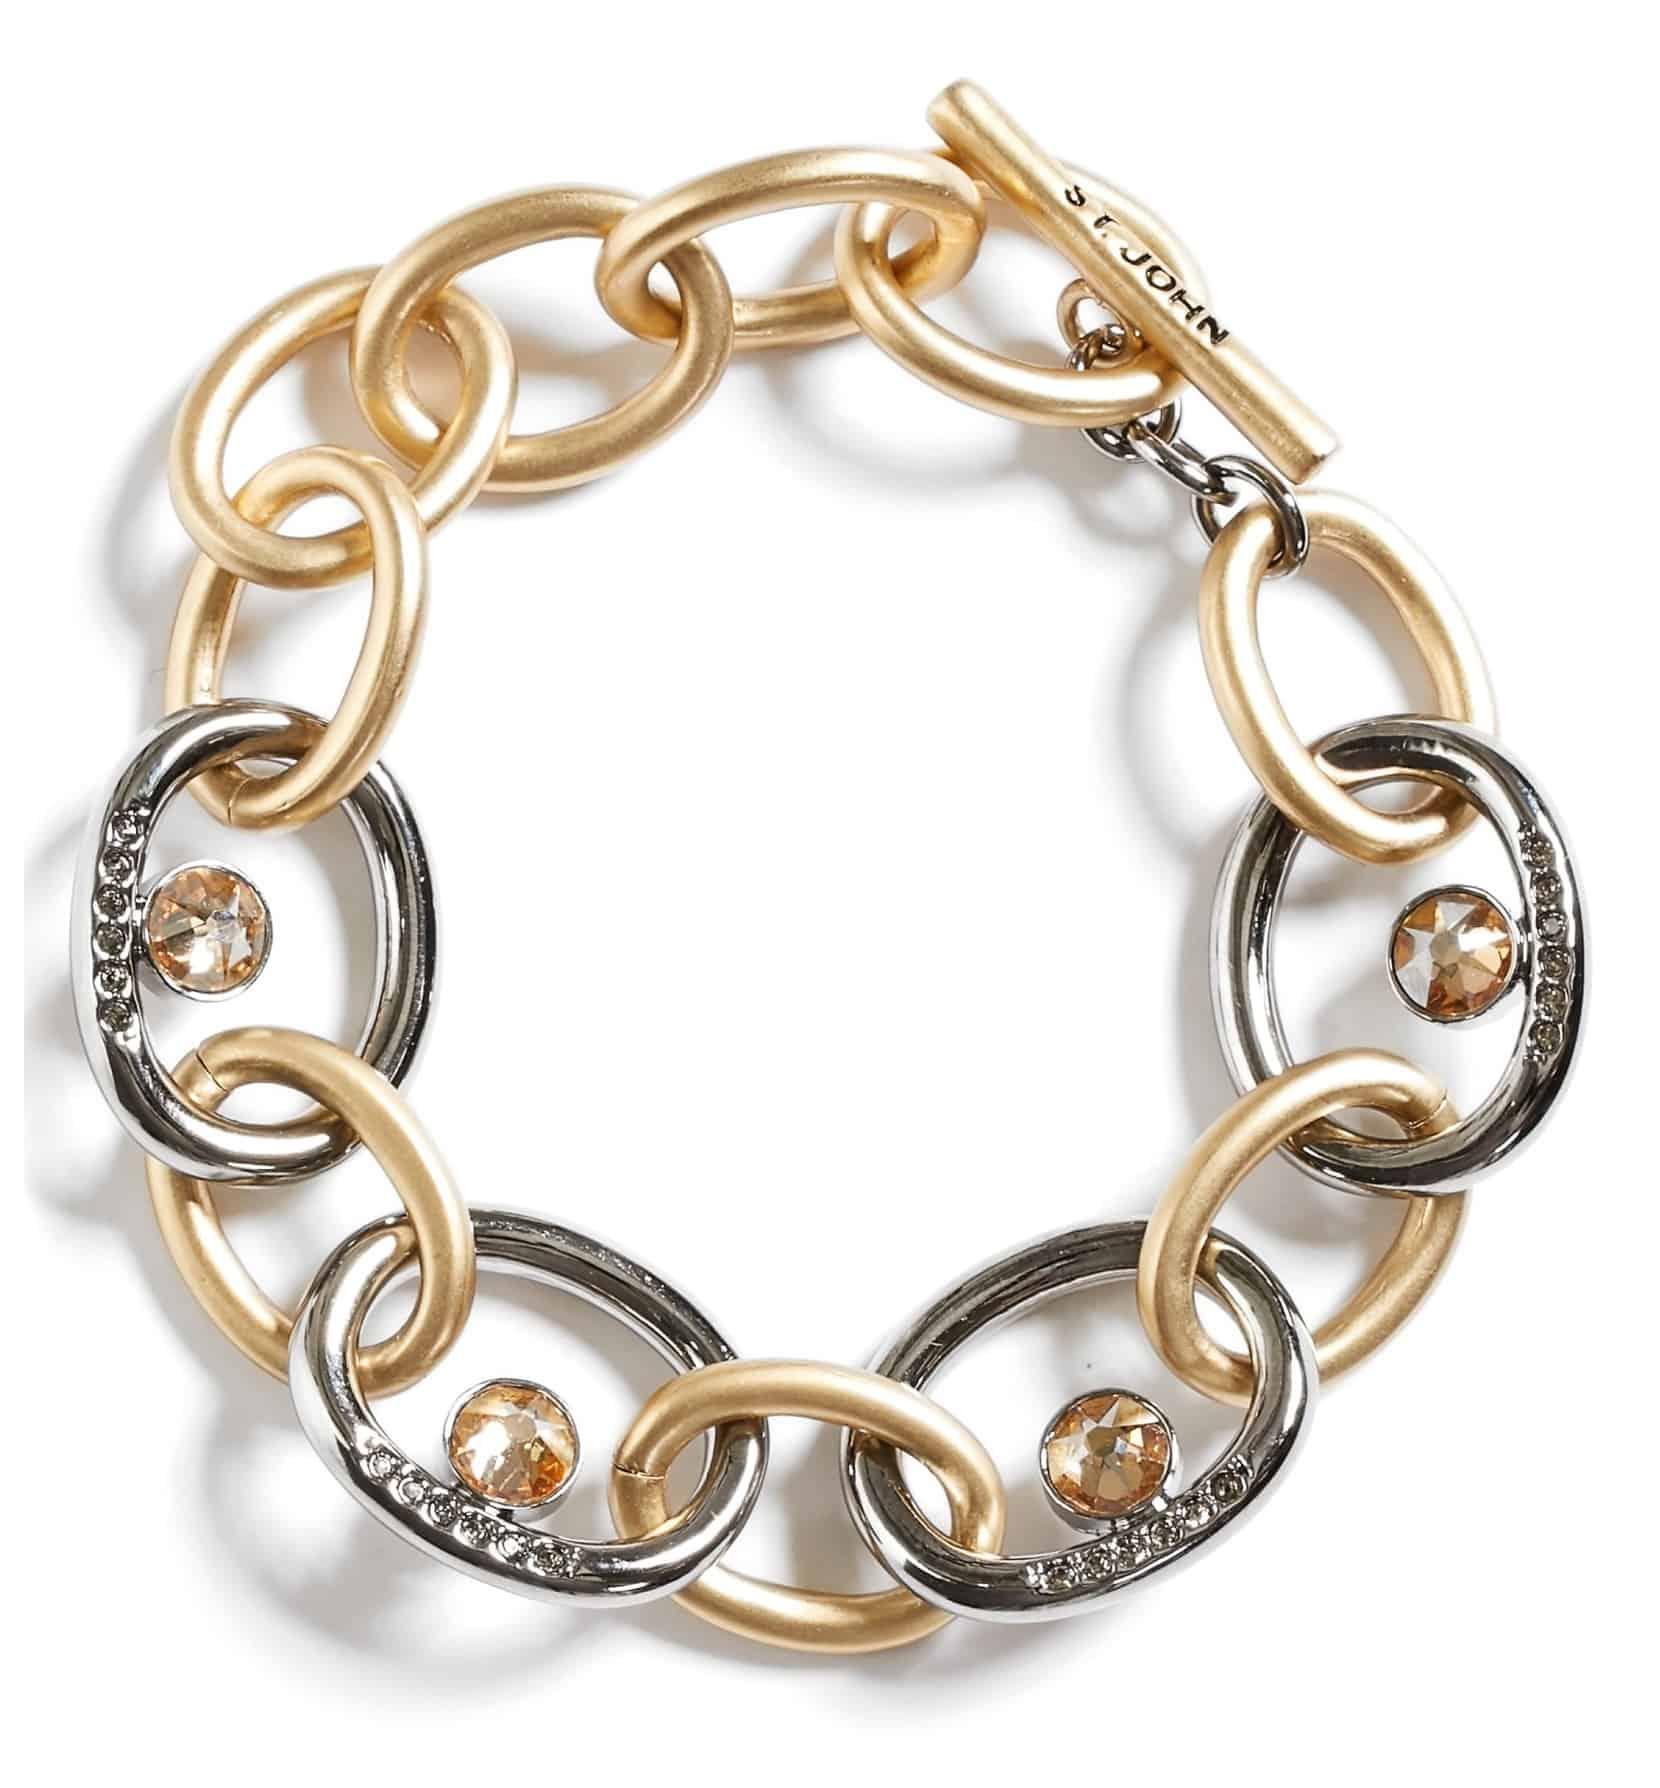 Swarovski Crystal & Metal Chain Bracelet